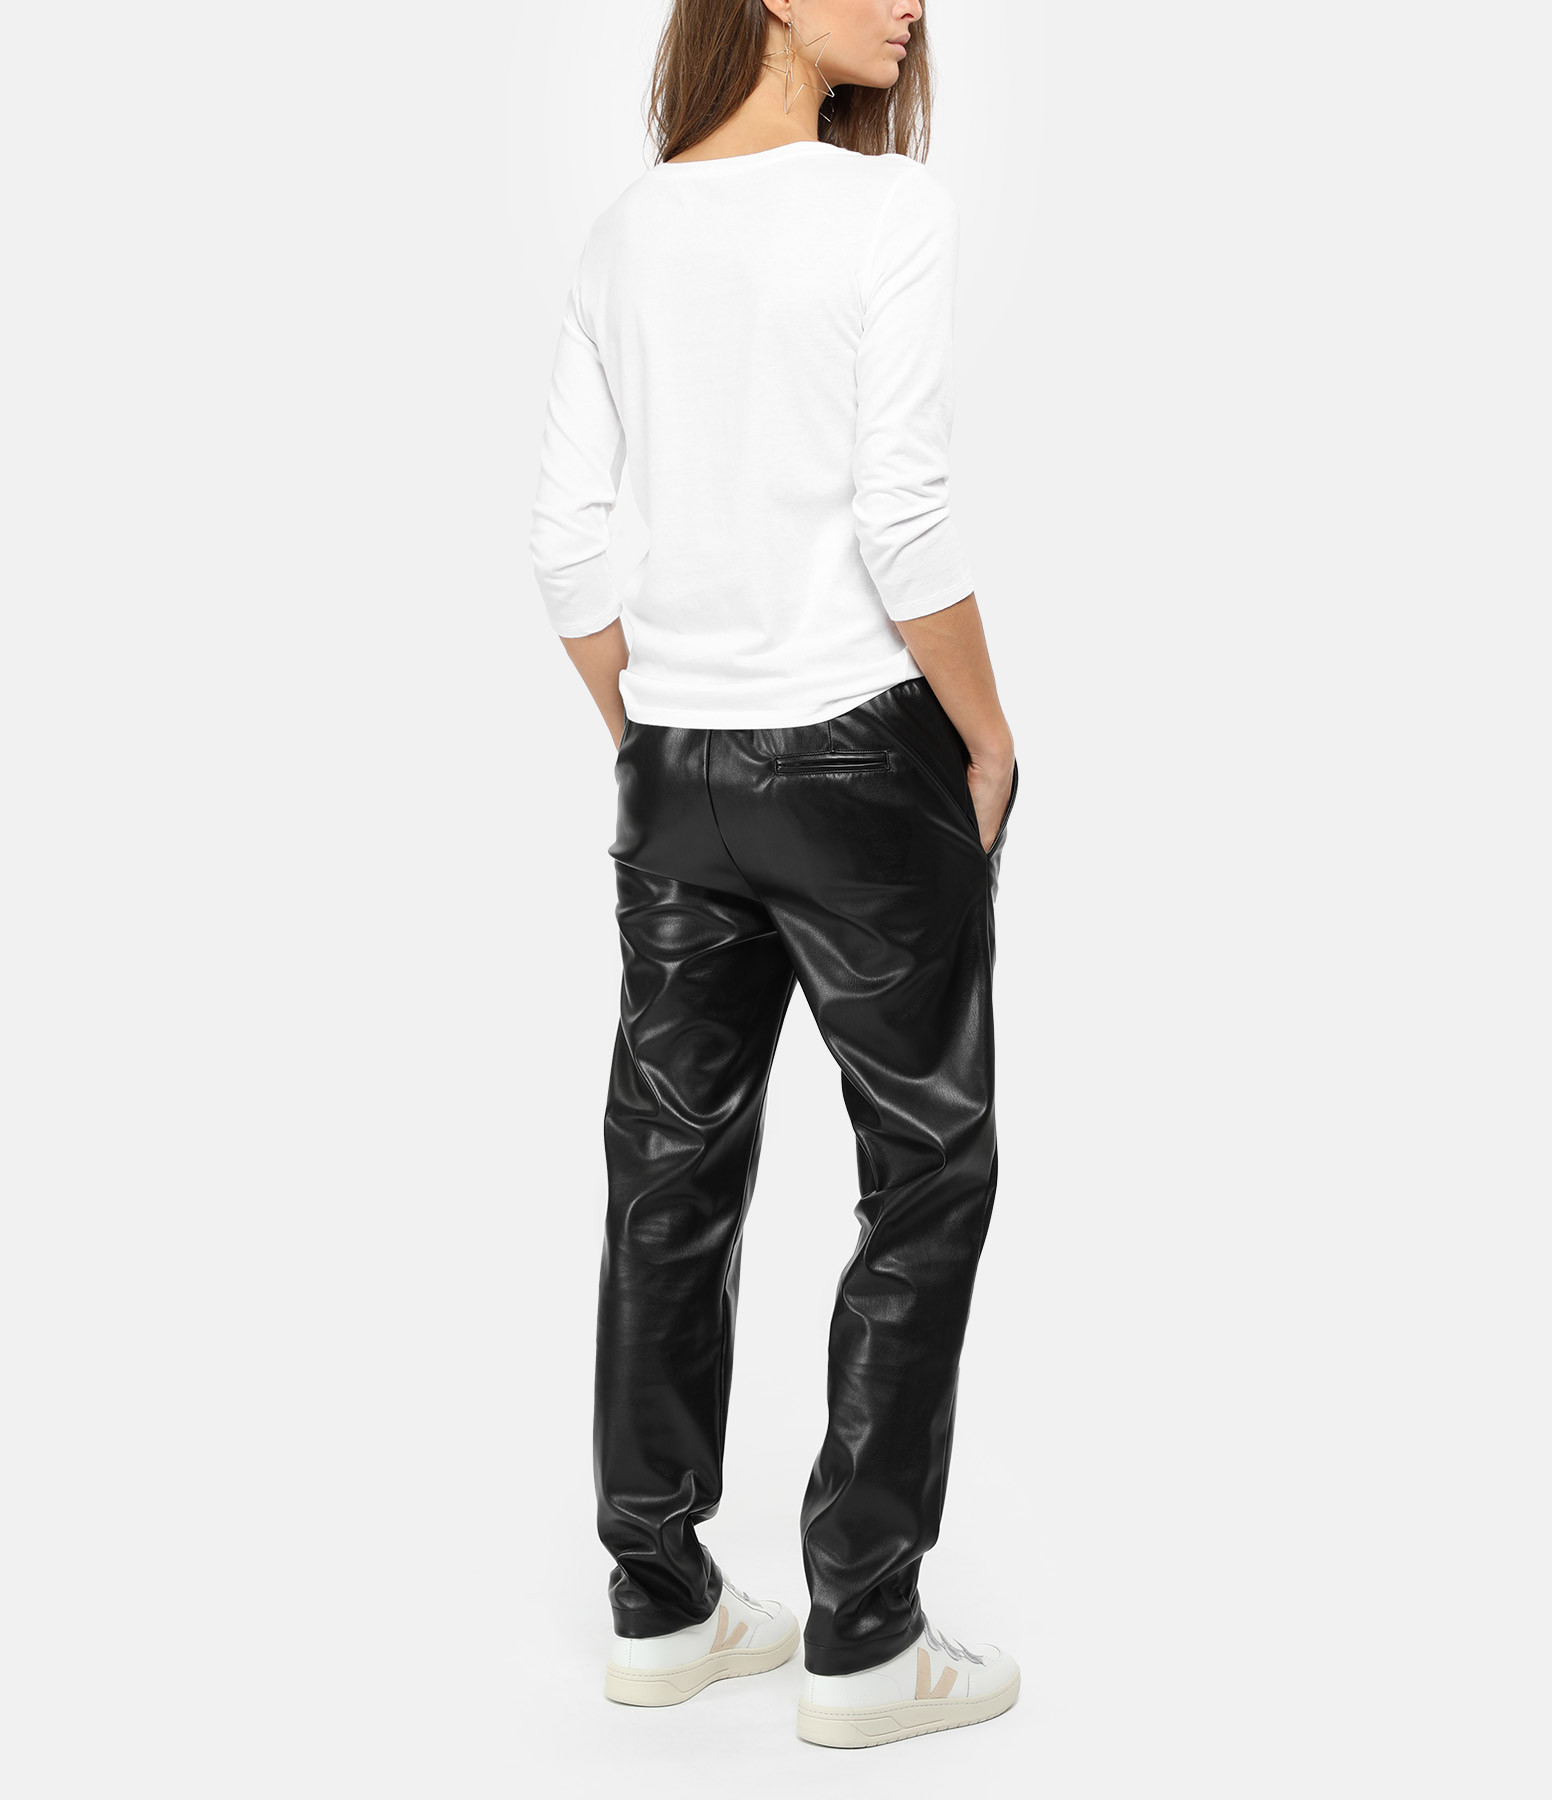 MAJESTIC FILATURES - Tee-shirt Col Bateau Blanc